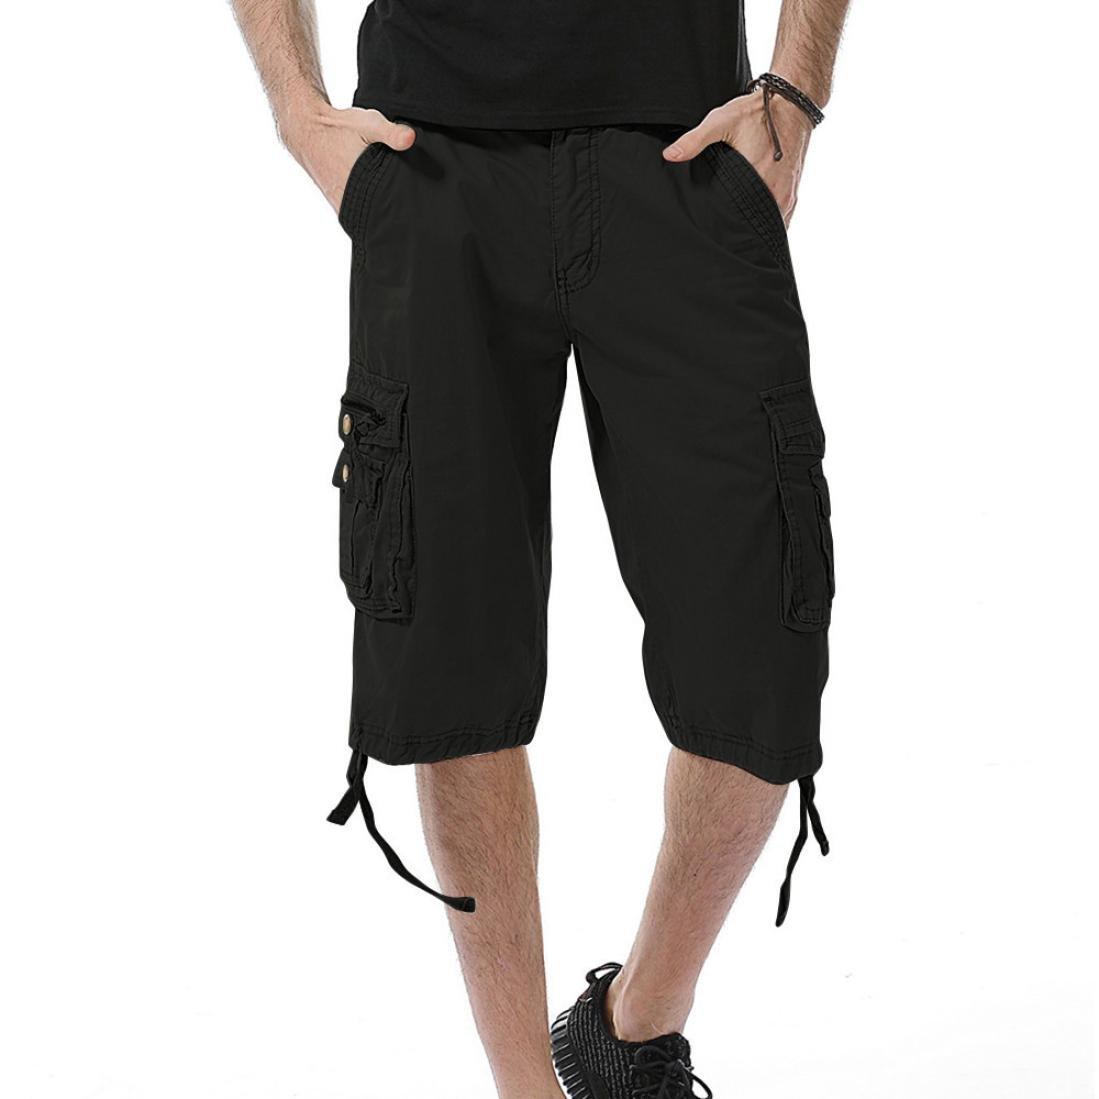 SUKEQ Men's Loos Fit Twill Cargo Shorts, Lightweight Cotton Multi-pocket Capri Pants Outwear (40, Black)